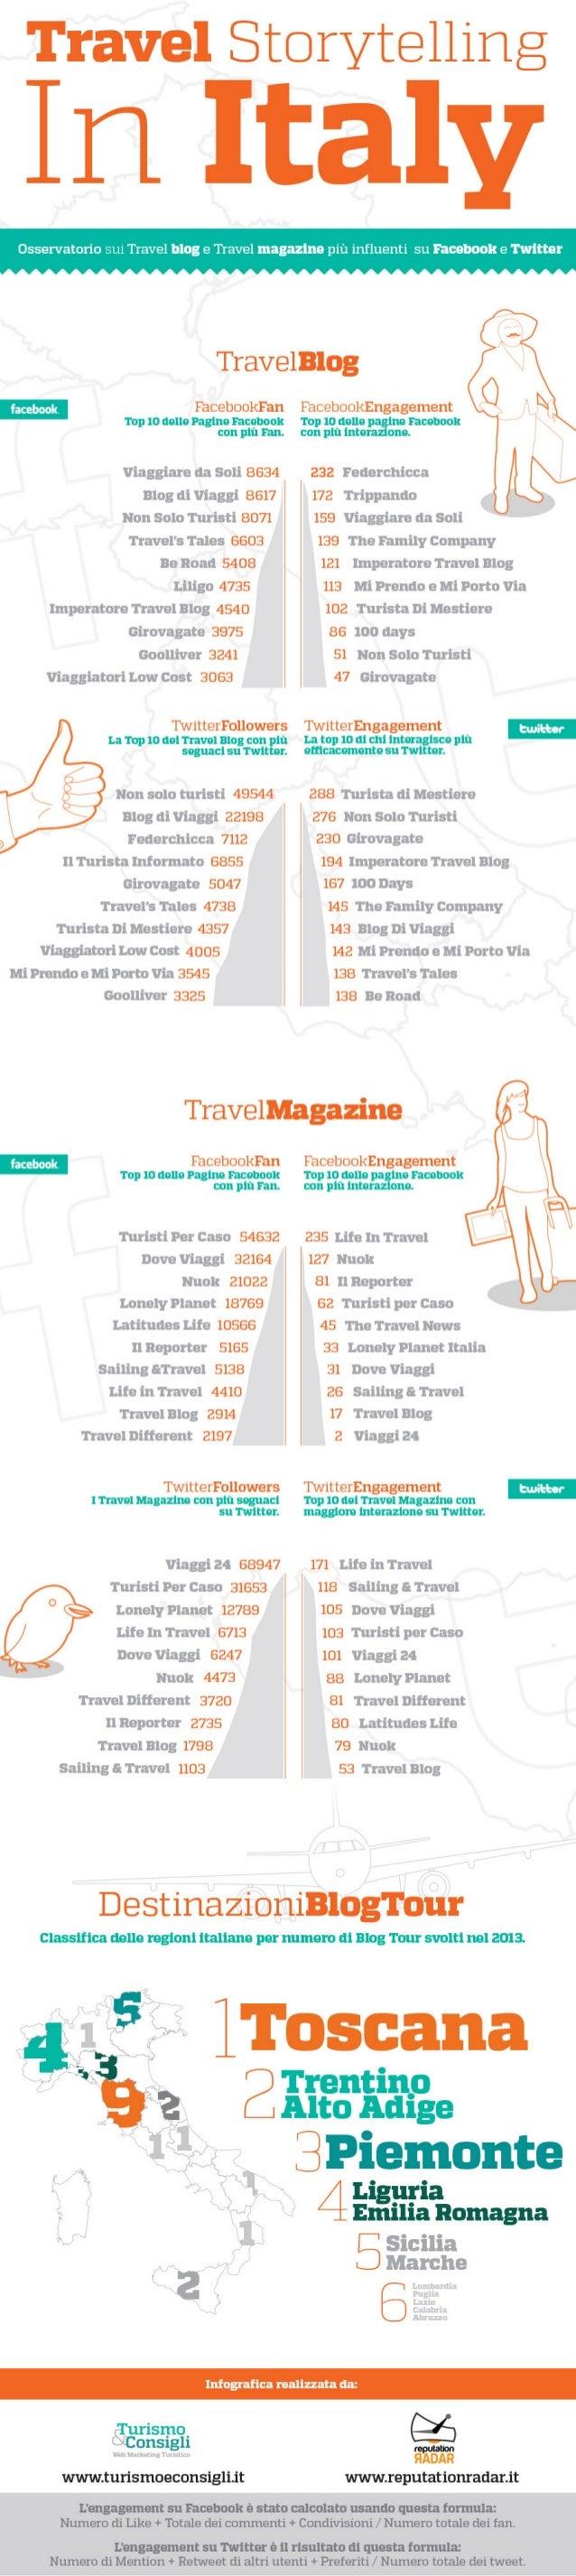 Classifica Travelblog e Travelmagazine più influenti - Infografica Storytelling Italia